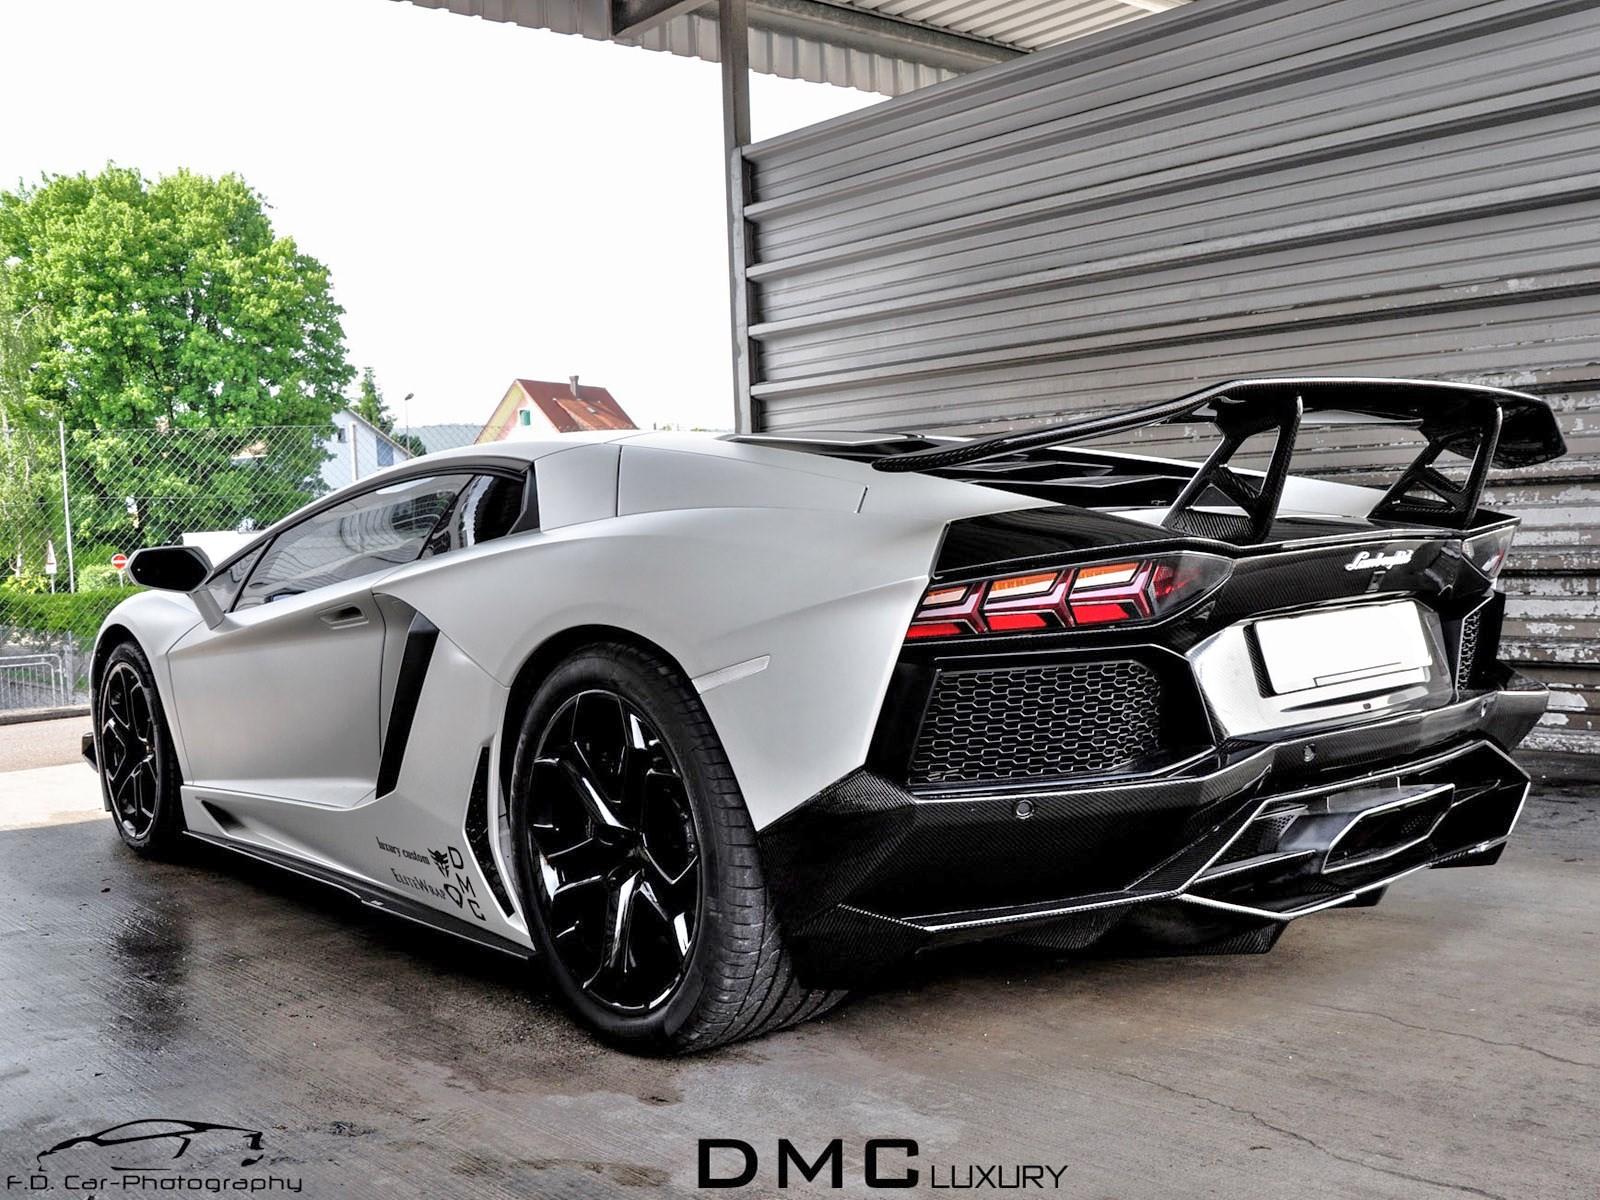 2013 Lamborghini Aventador lp900 SV Spezial Version by DMC Design